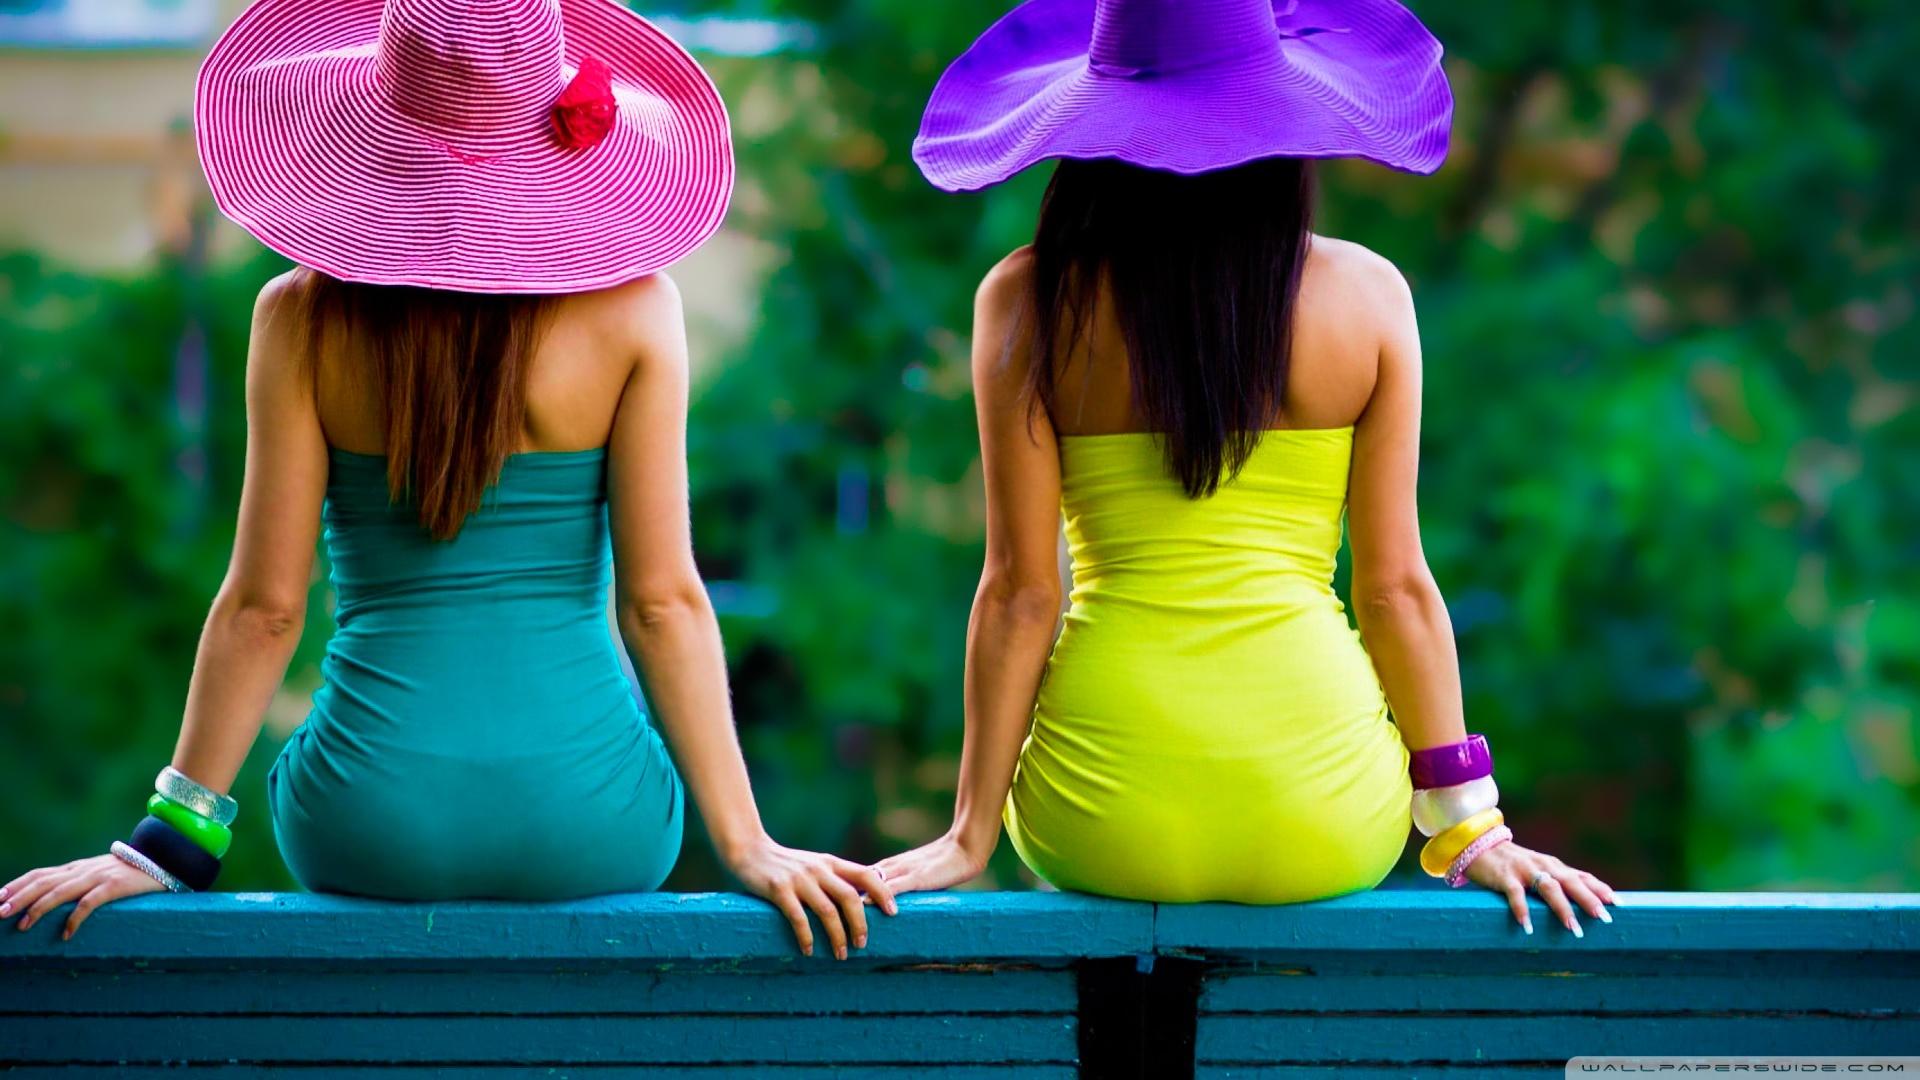 Risultati immagini per donne d'estate